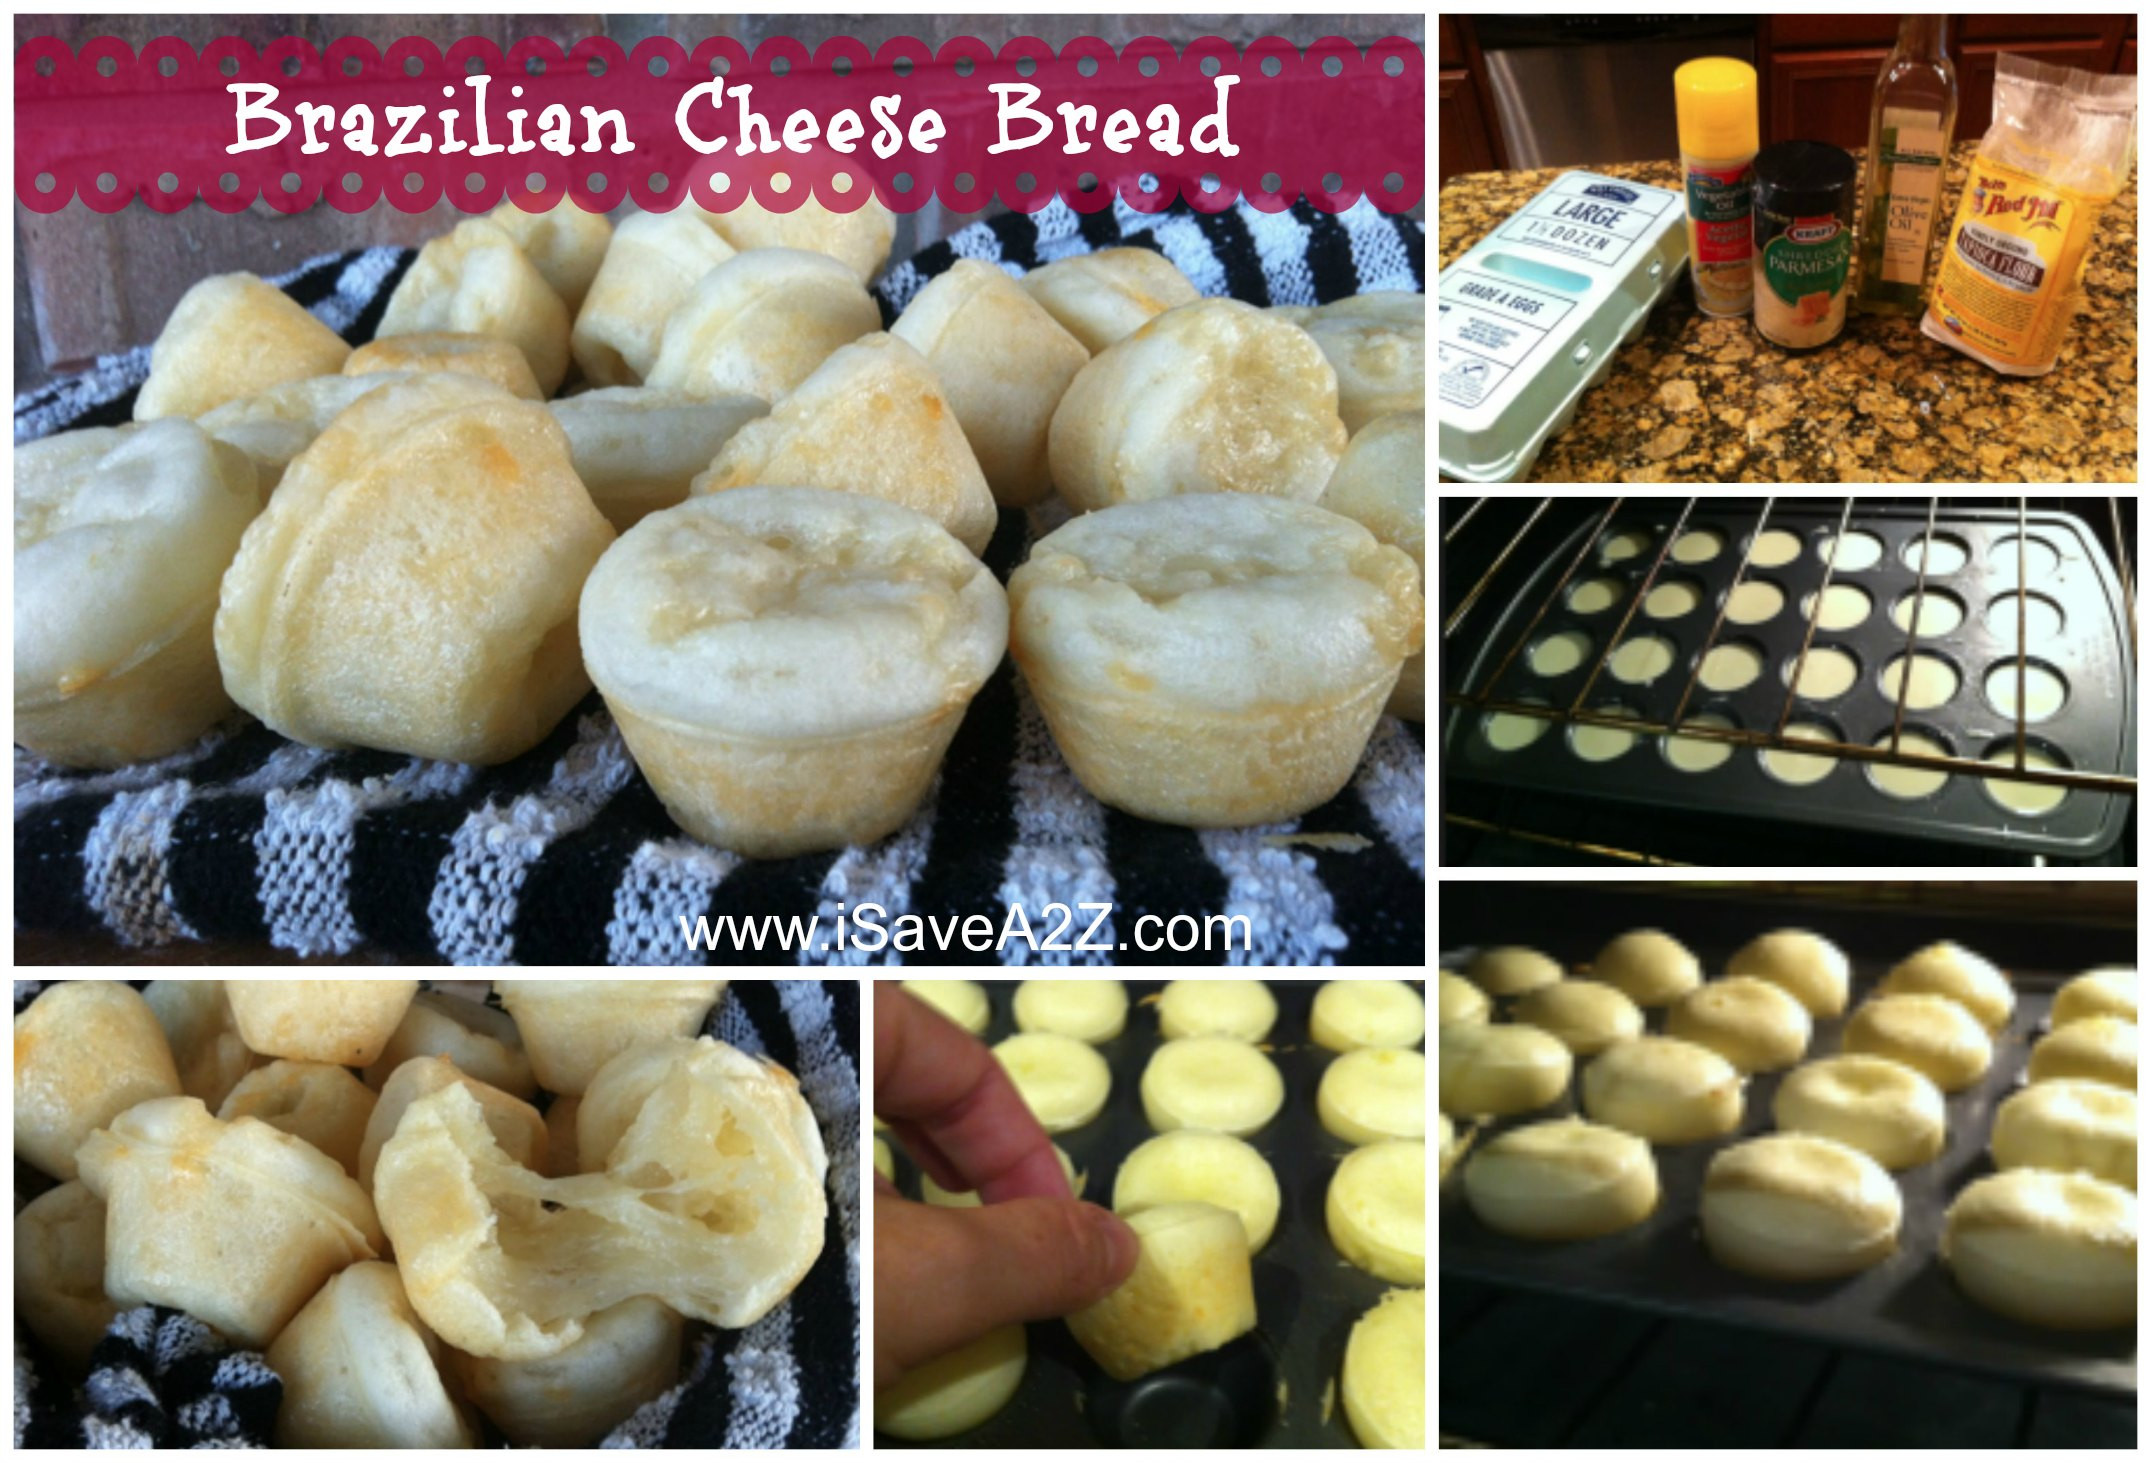 Brazilian Cheese Bread Recipe  Try this amazing Brazilian Cheese Bread recipe